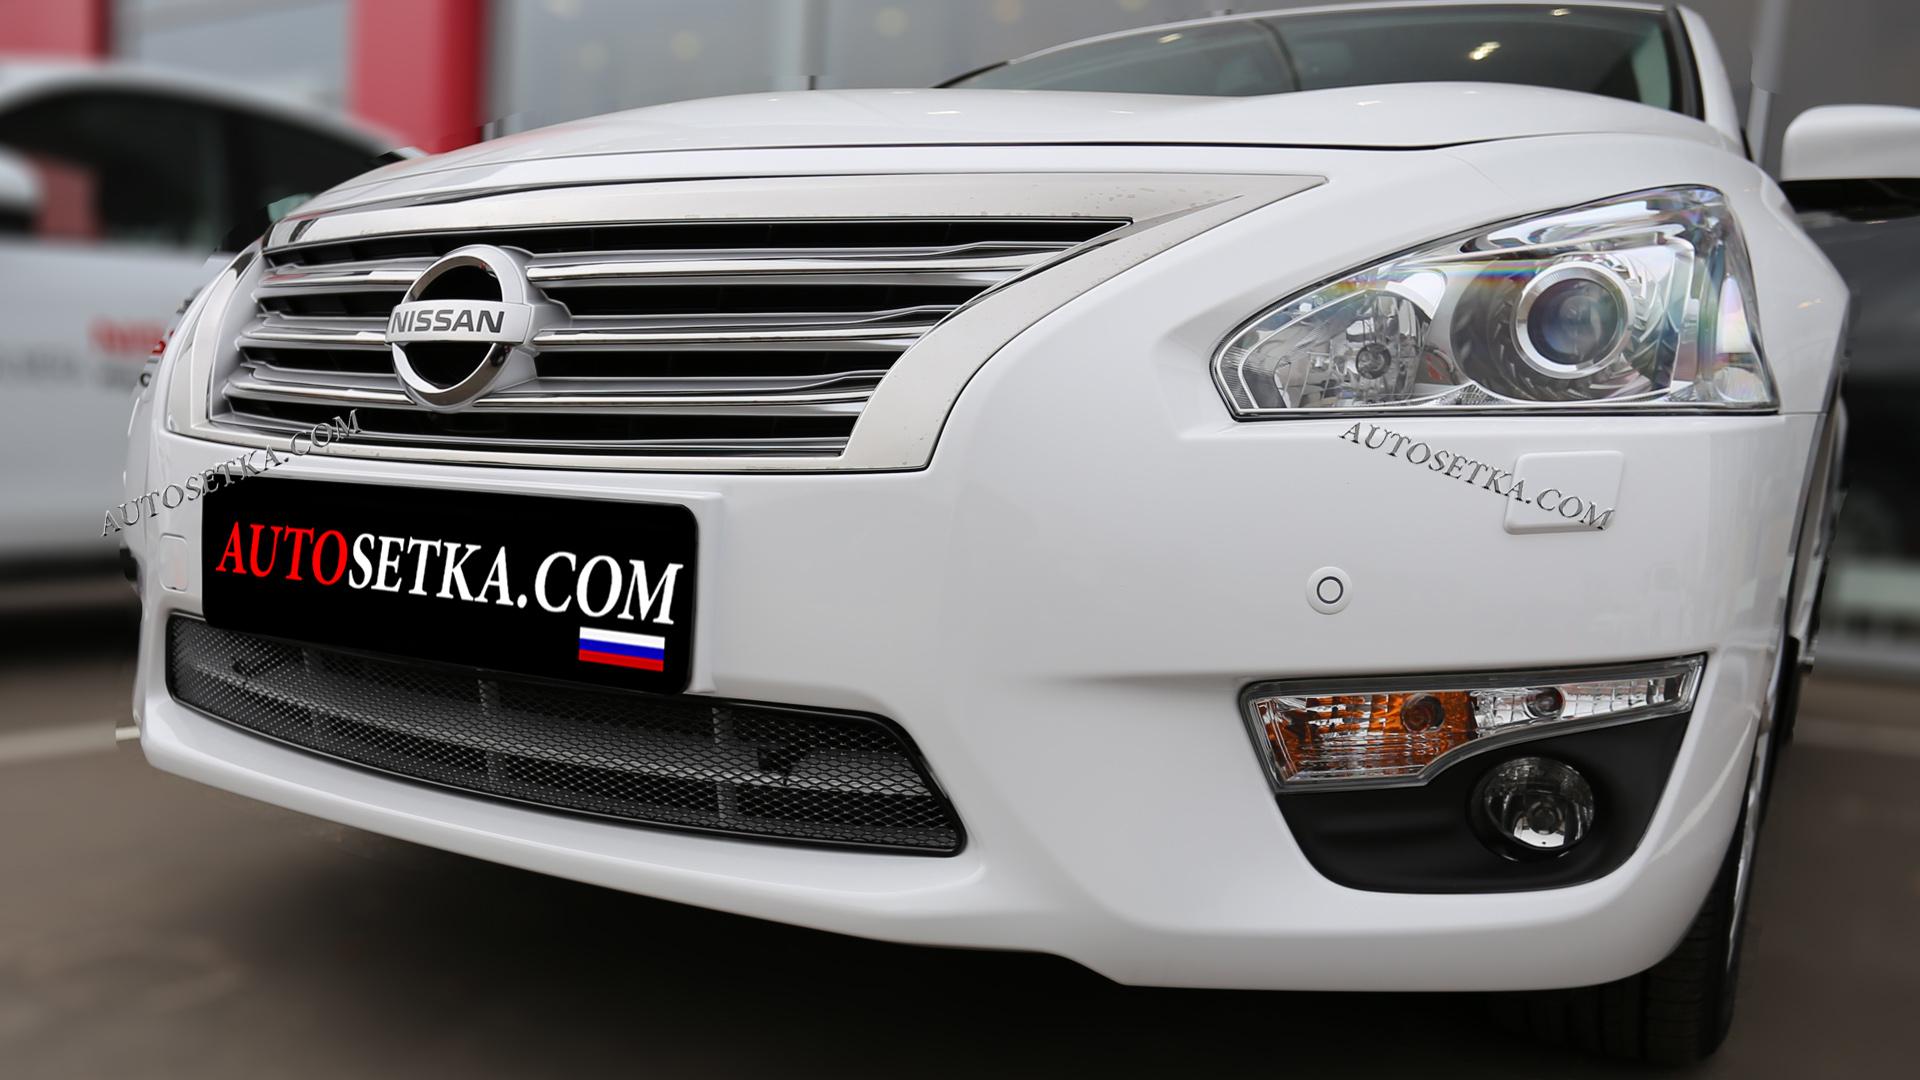 Защита радиатора Nissan Teana 2014-